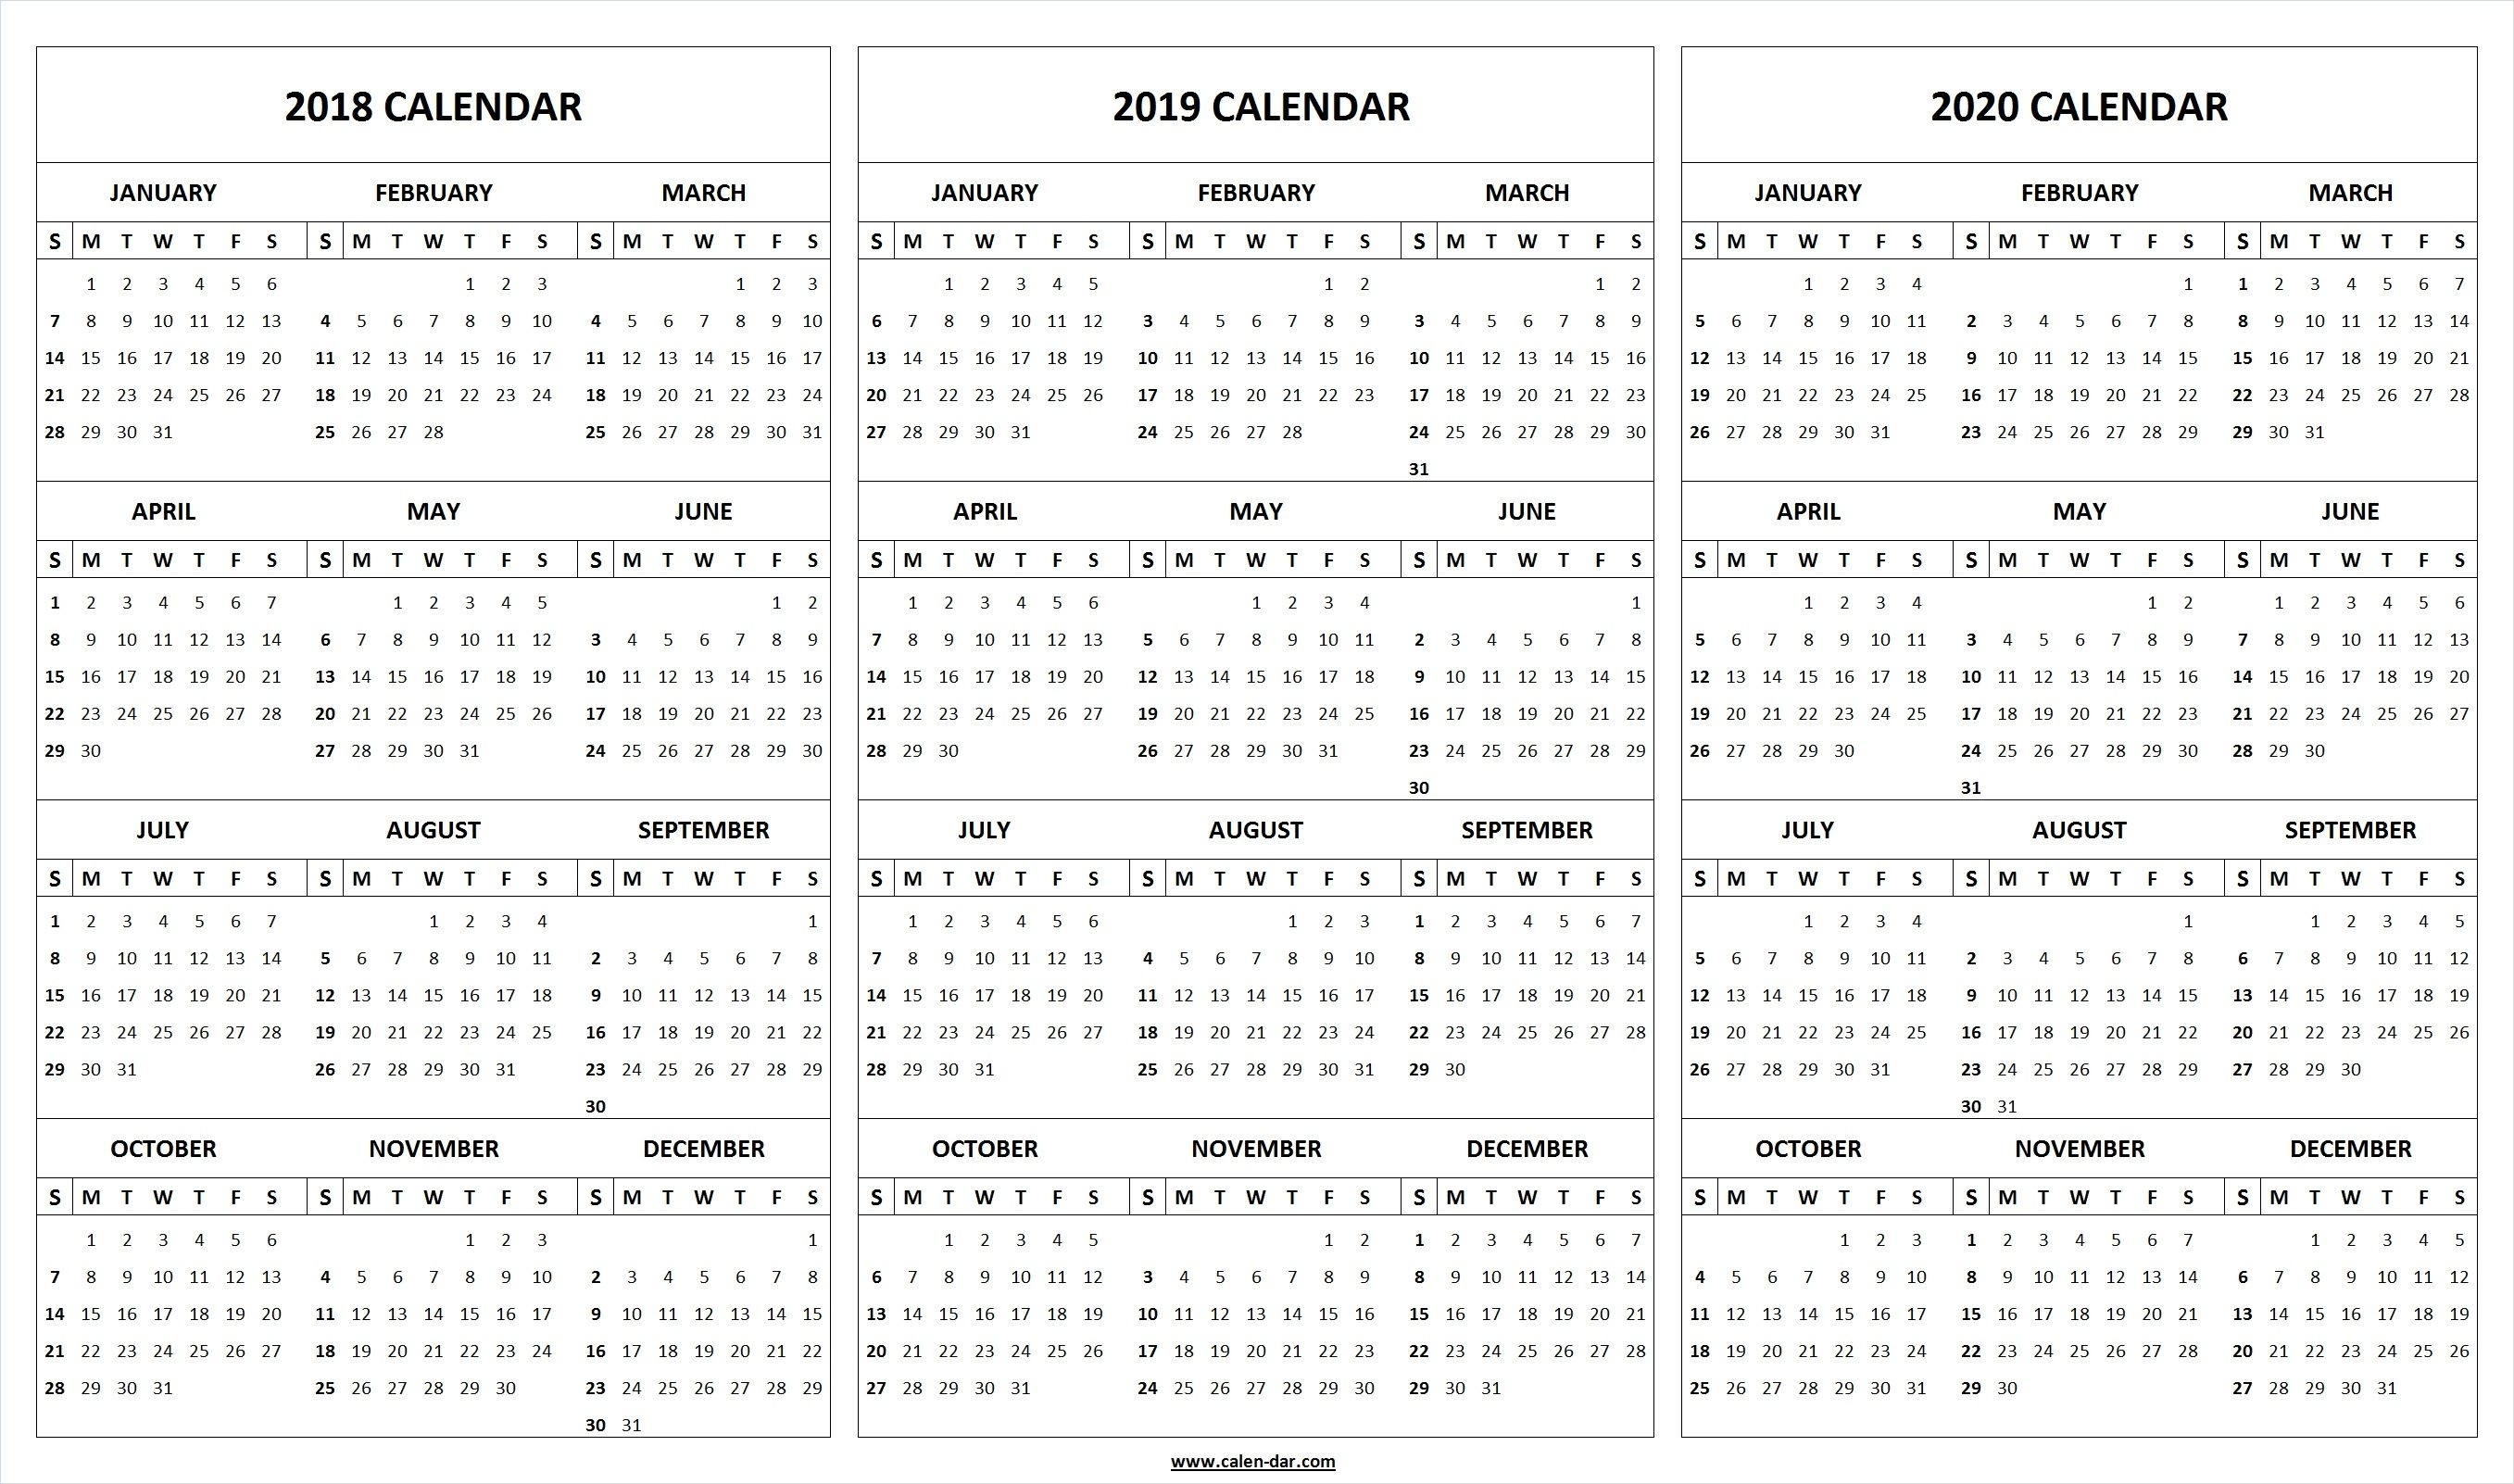 Print Blank 2018 2019 2020 Calendar Template | Organize! | Printable with regard to Printable Calendar 2019 2020 Write On